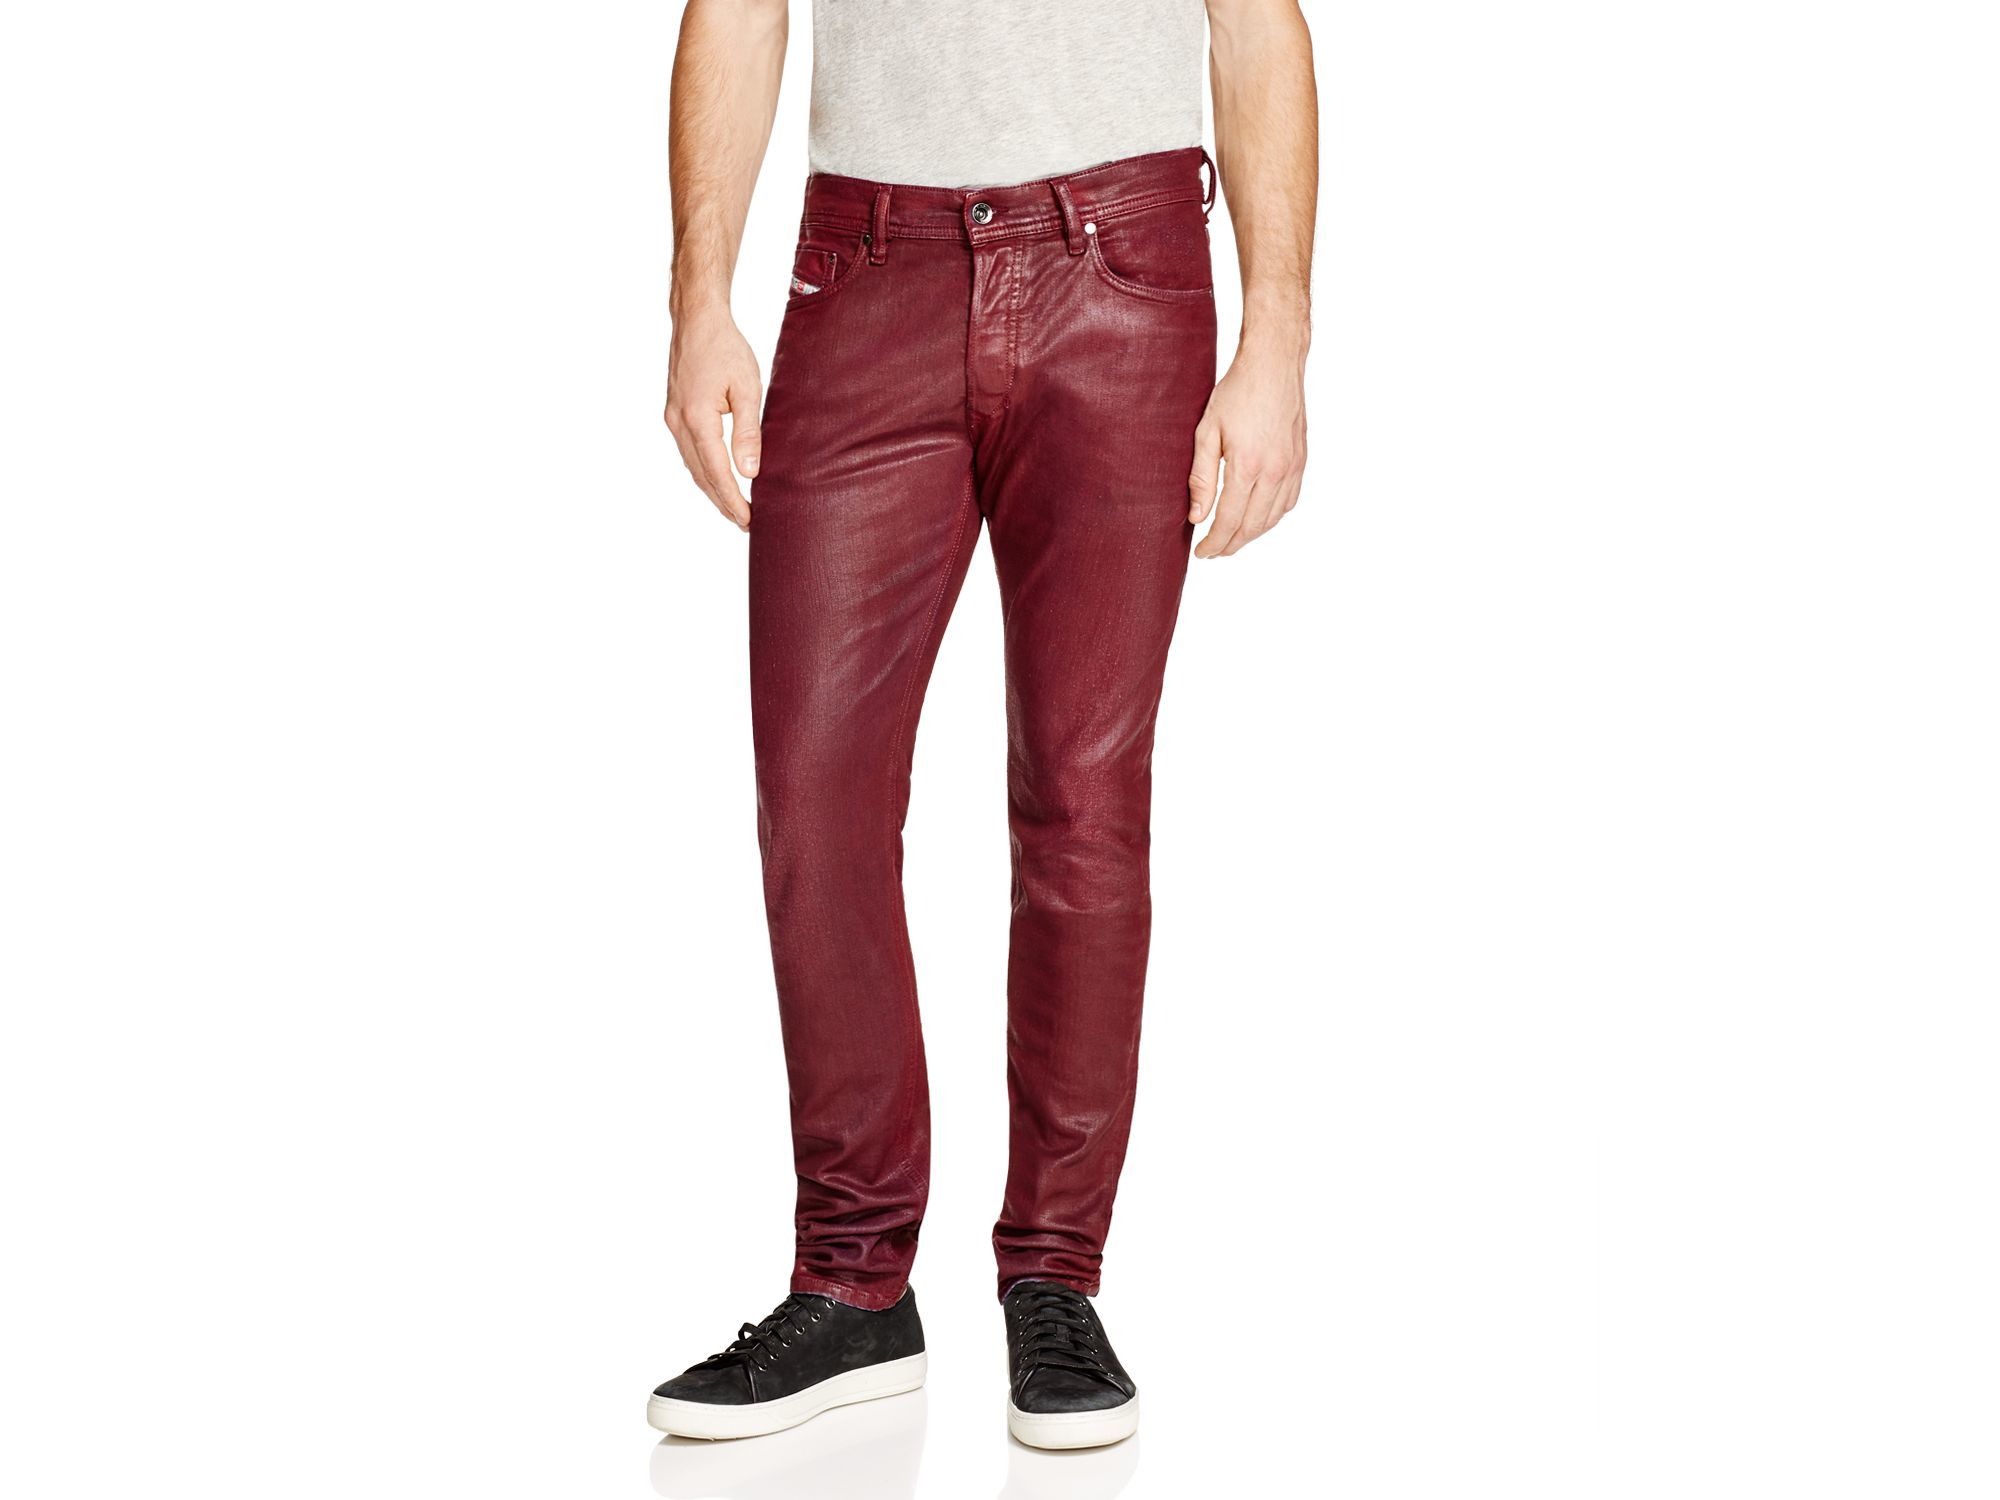 Diesel Tepphar Burgundy Coated Super Slim Fit Jeans In Red in Red ...